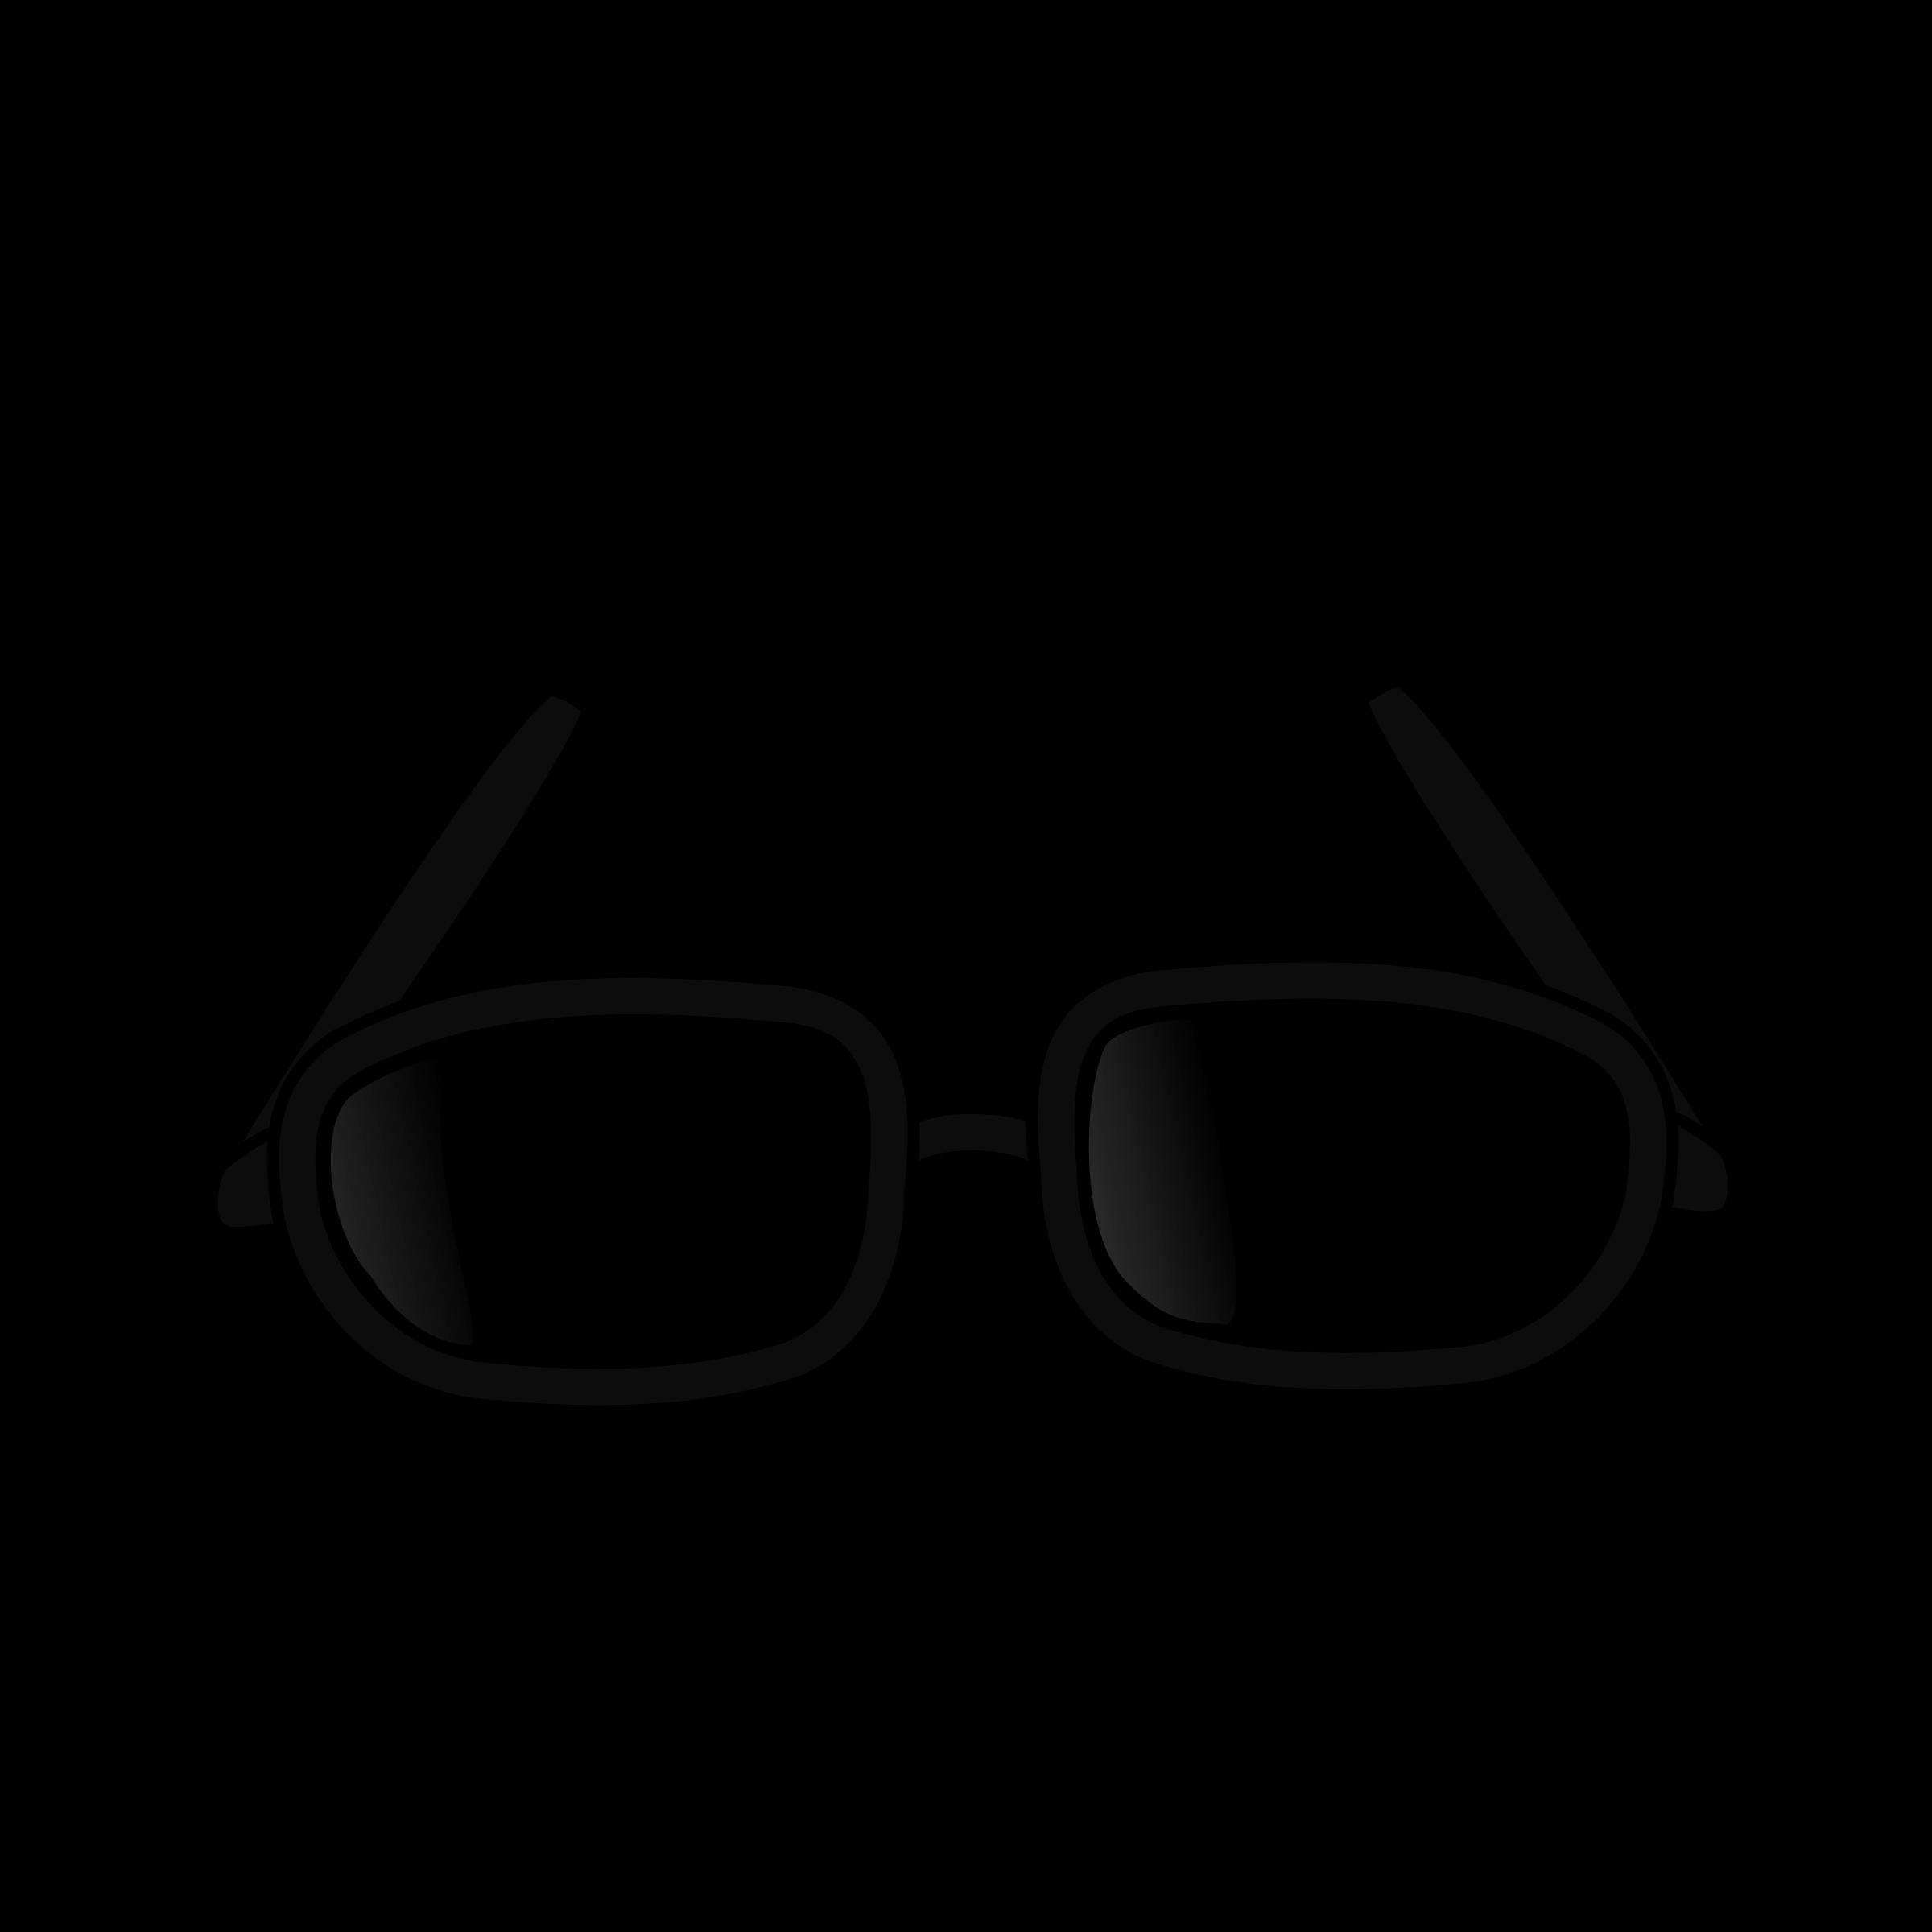 Clipart sunglasses line art. Eyeglass panda free images